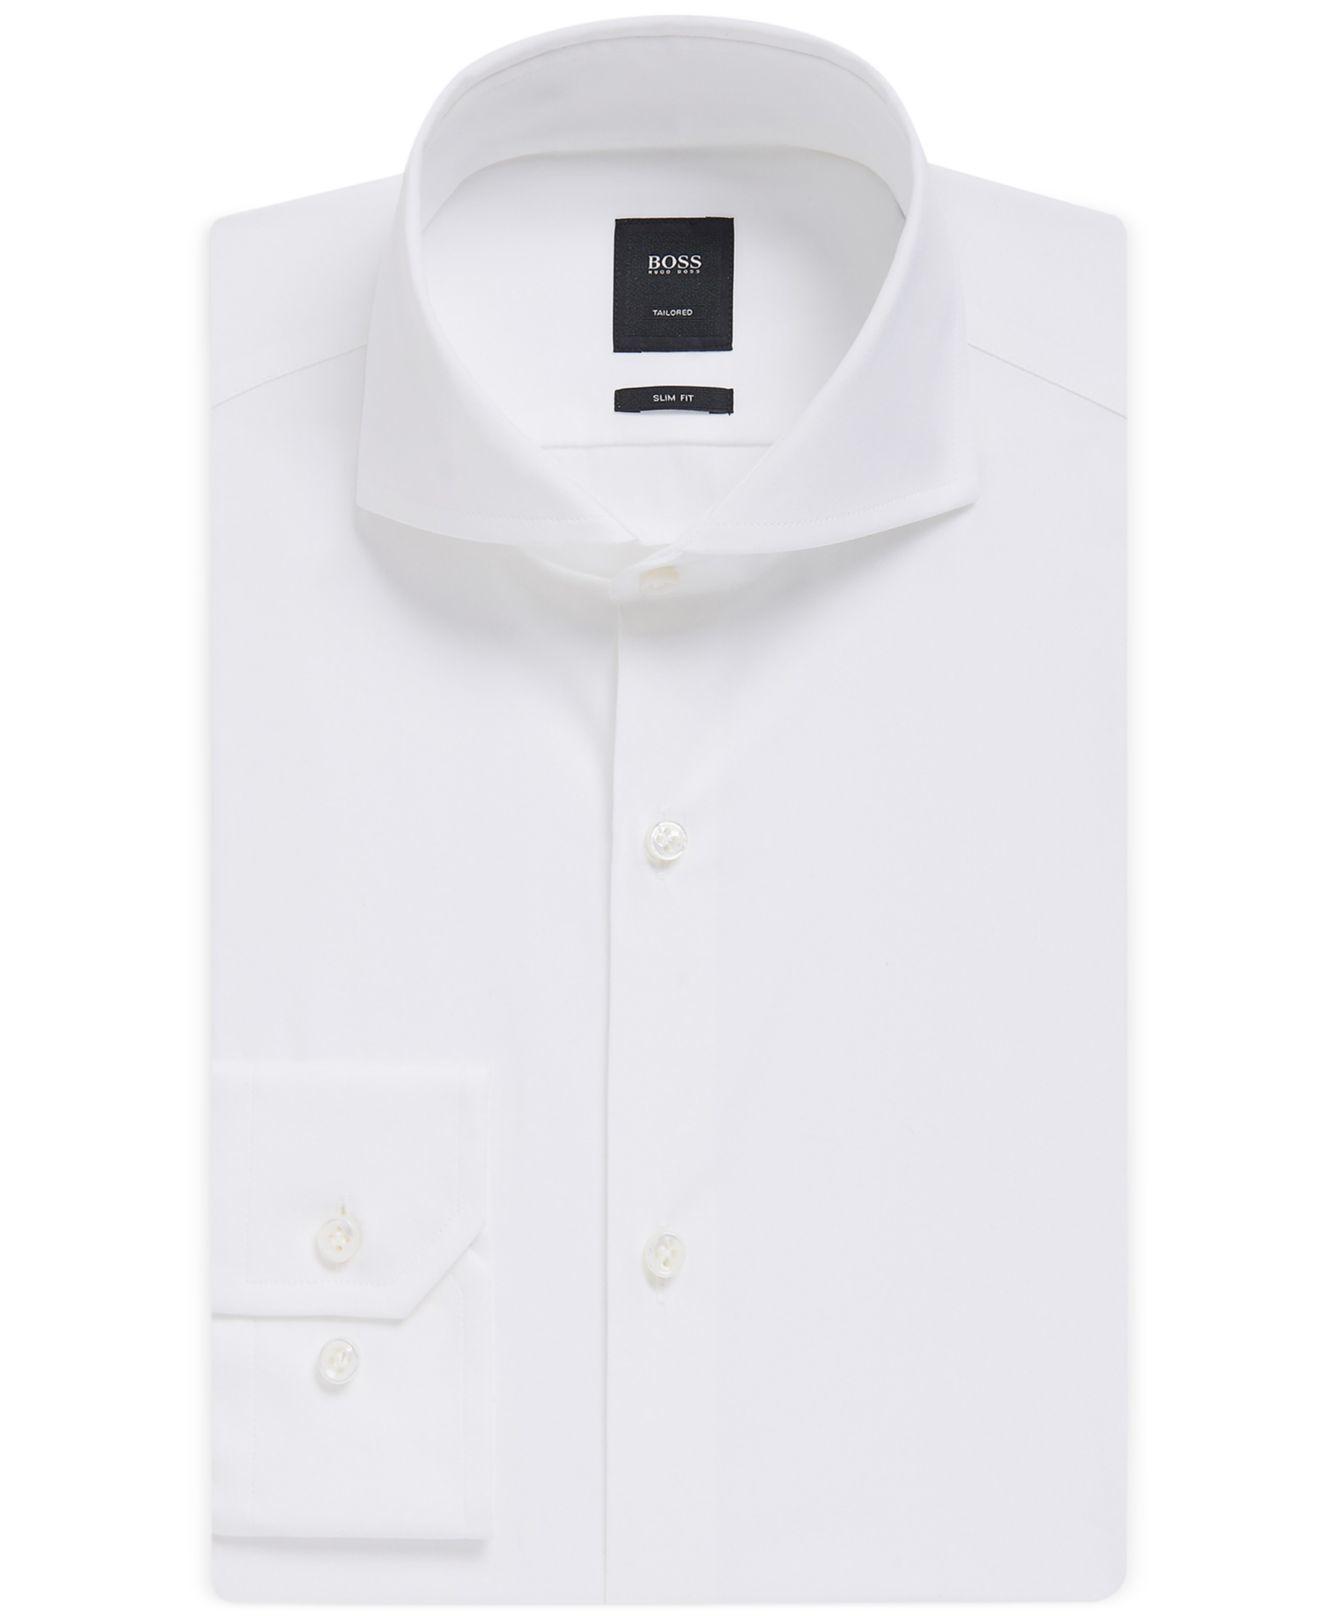 Boss Boss Slim Fit Tailored Italian Dress Shirt In White